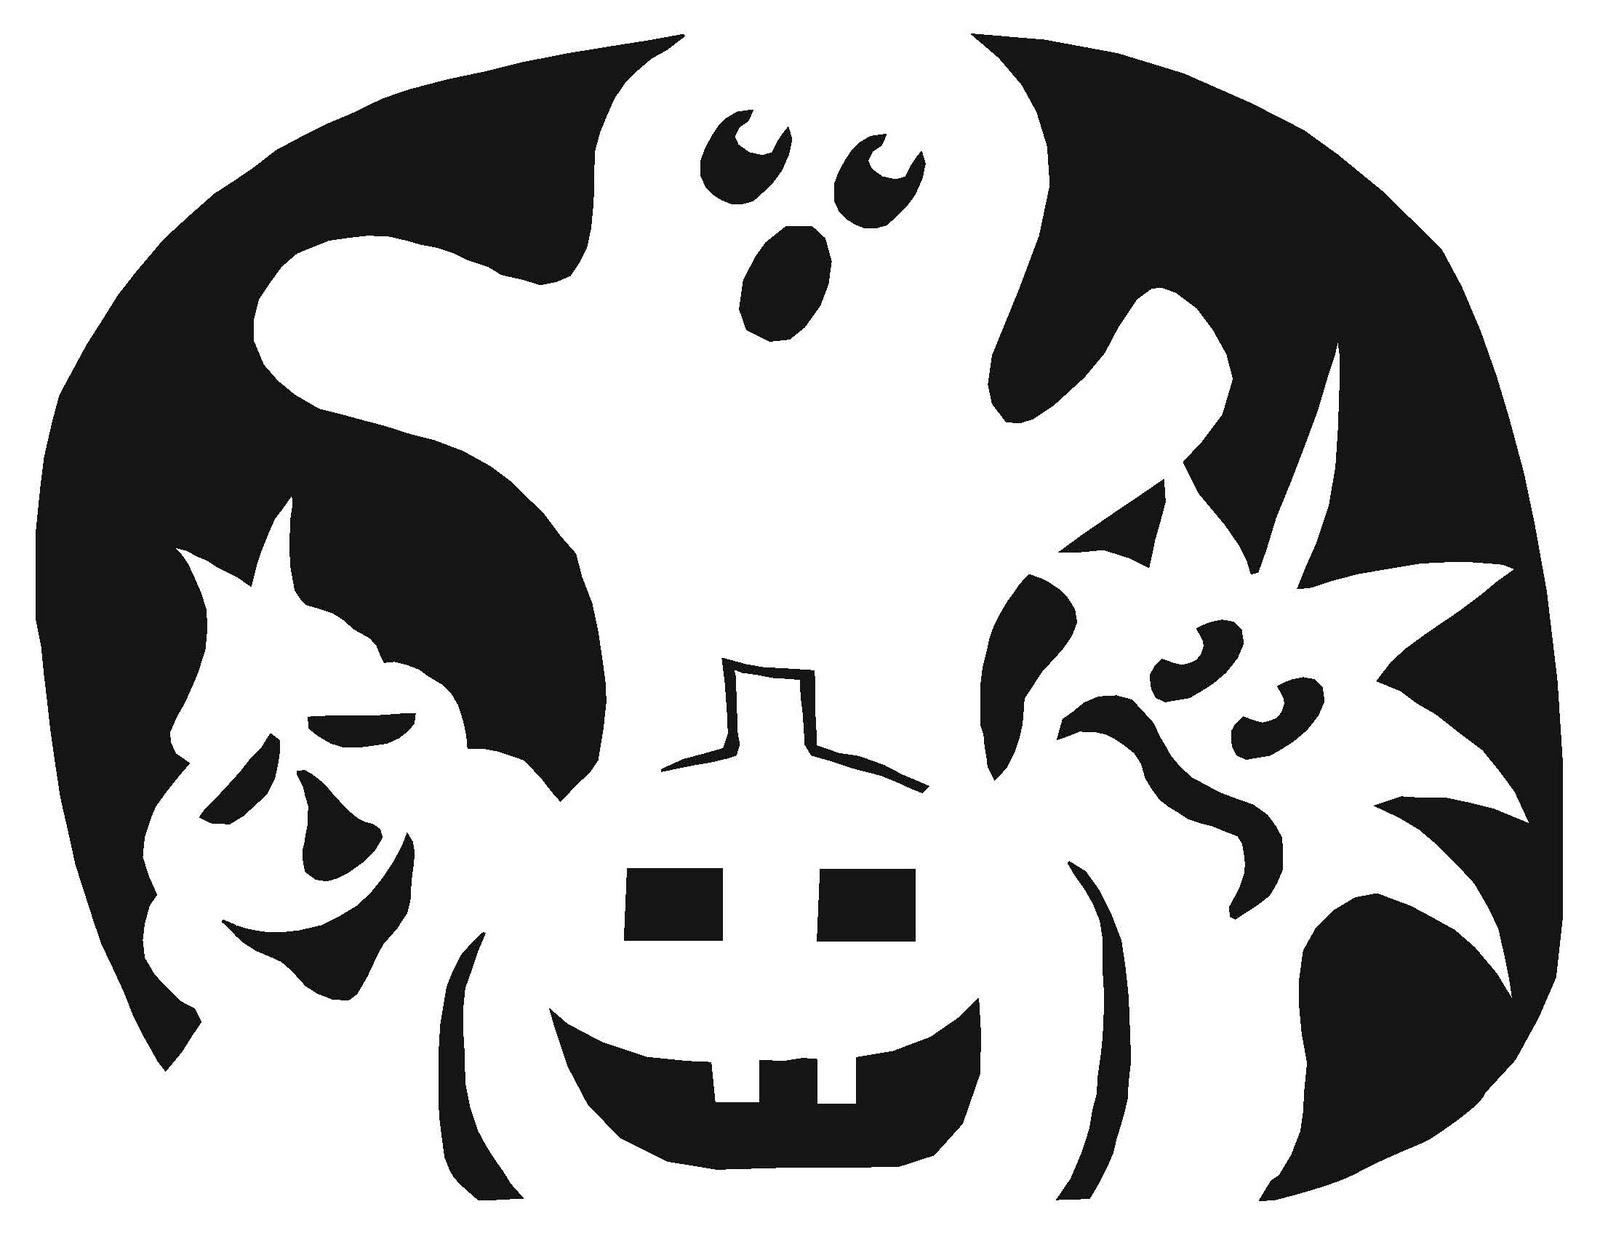 Free Guitar Pumpkin Stencil, Download Free Clip Art, Free Clip Art - Free Printable Pumpkin Carving Templates